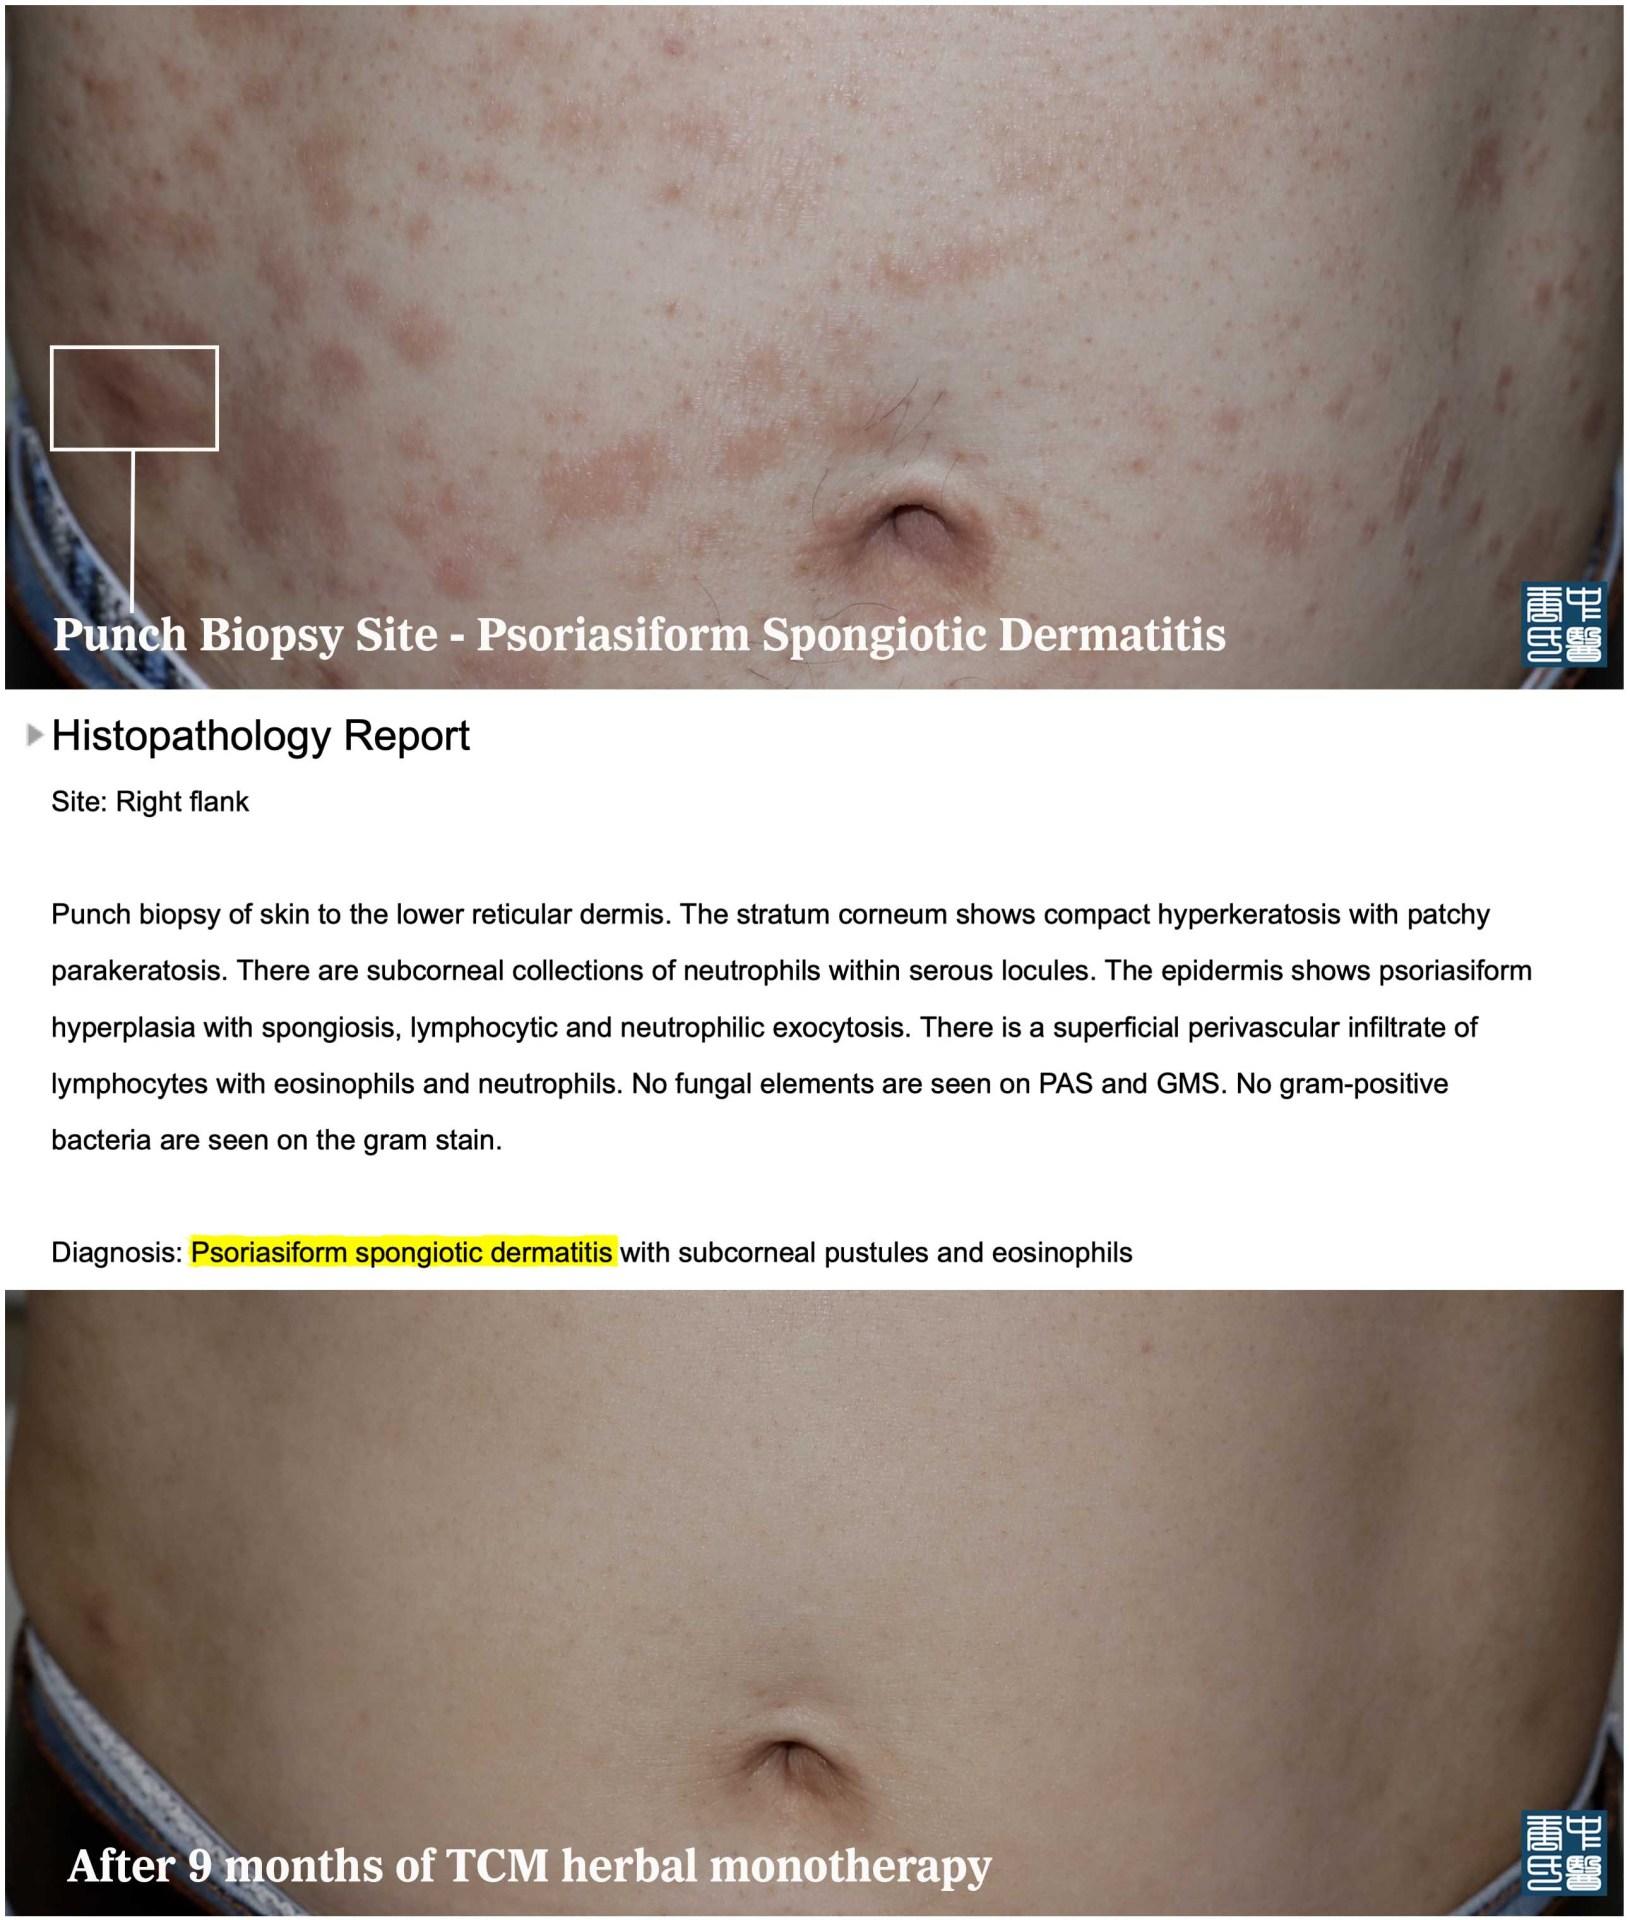 Psoriasiform Spongiotic Dermatitis Histology 4